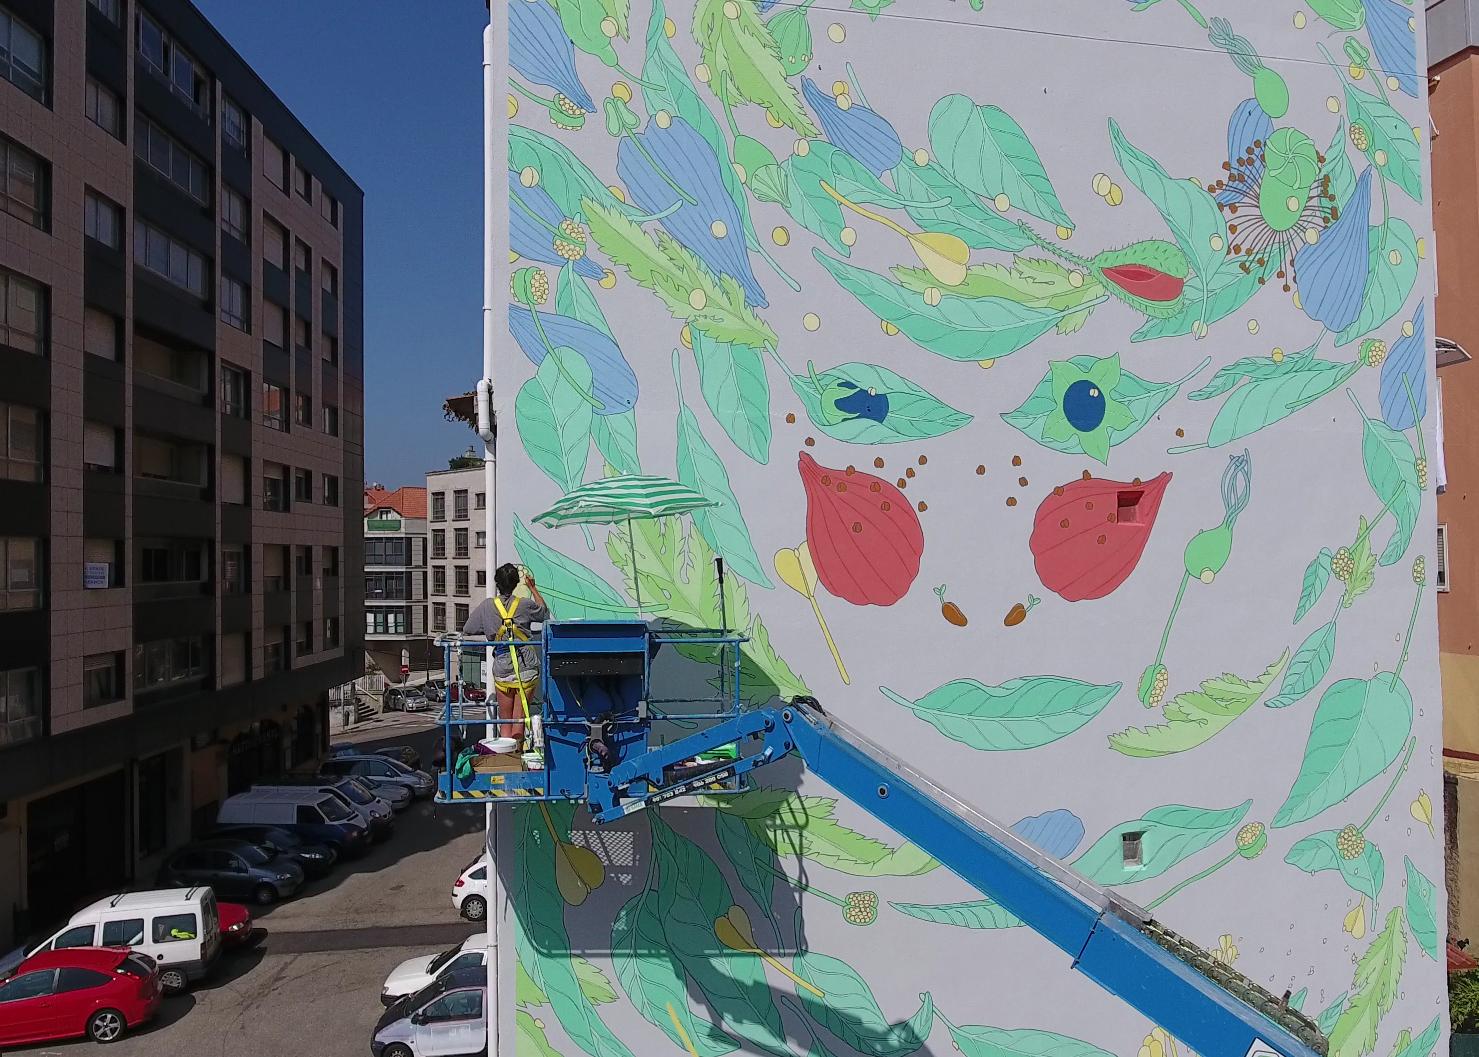 street art vigo city of colours mur floral visage Doa Ocampo - Destination Vigo, la nouvelle capitale espagnole du street art